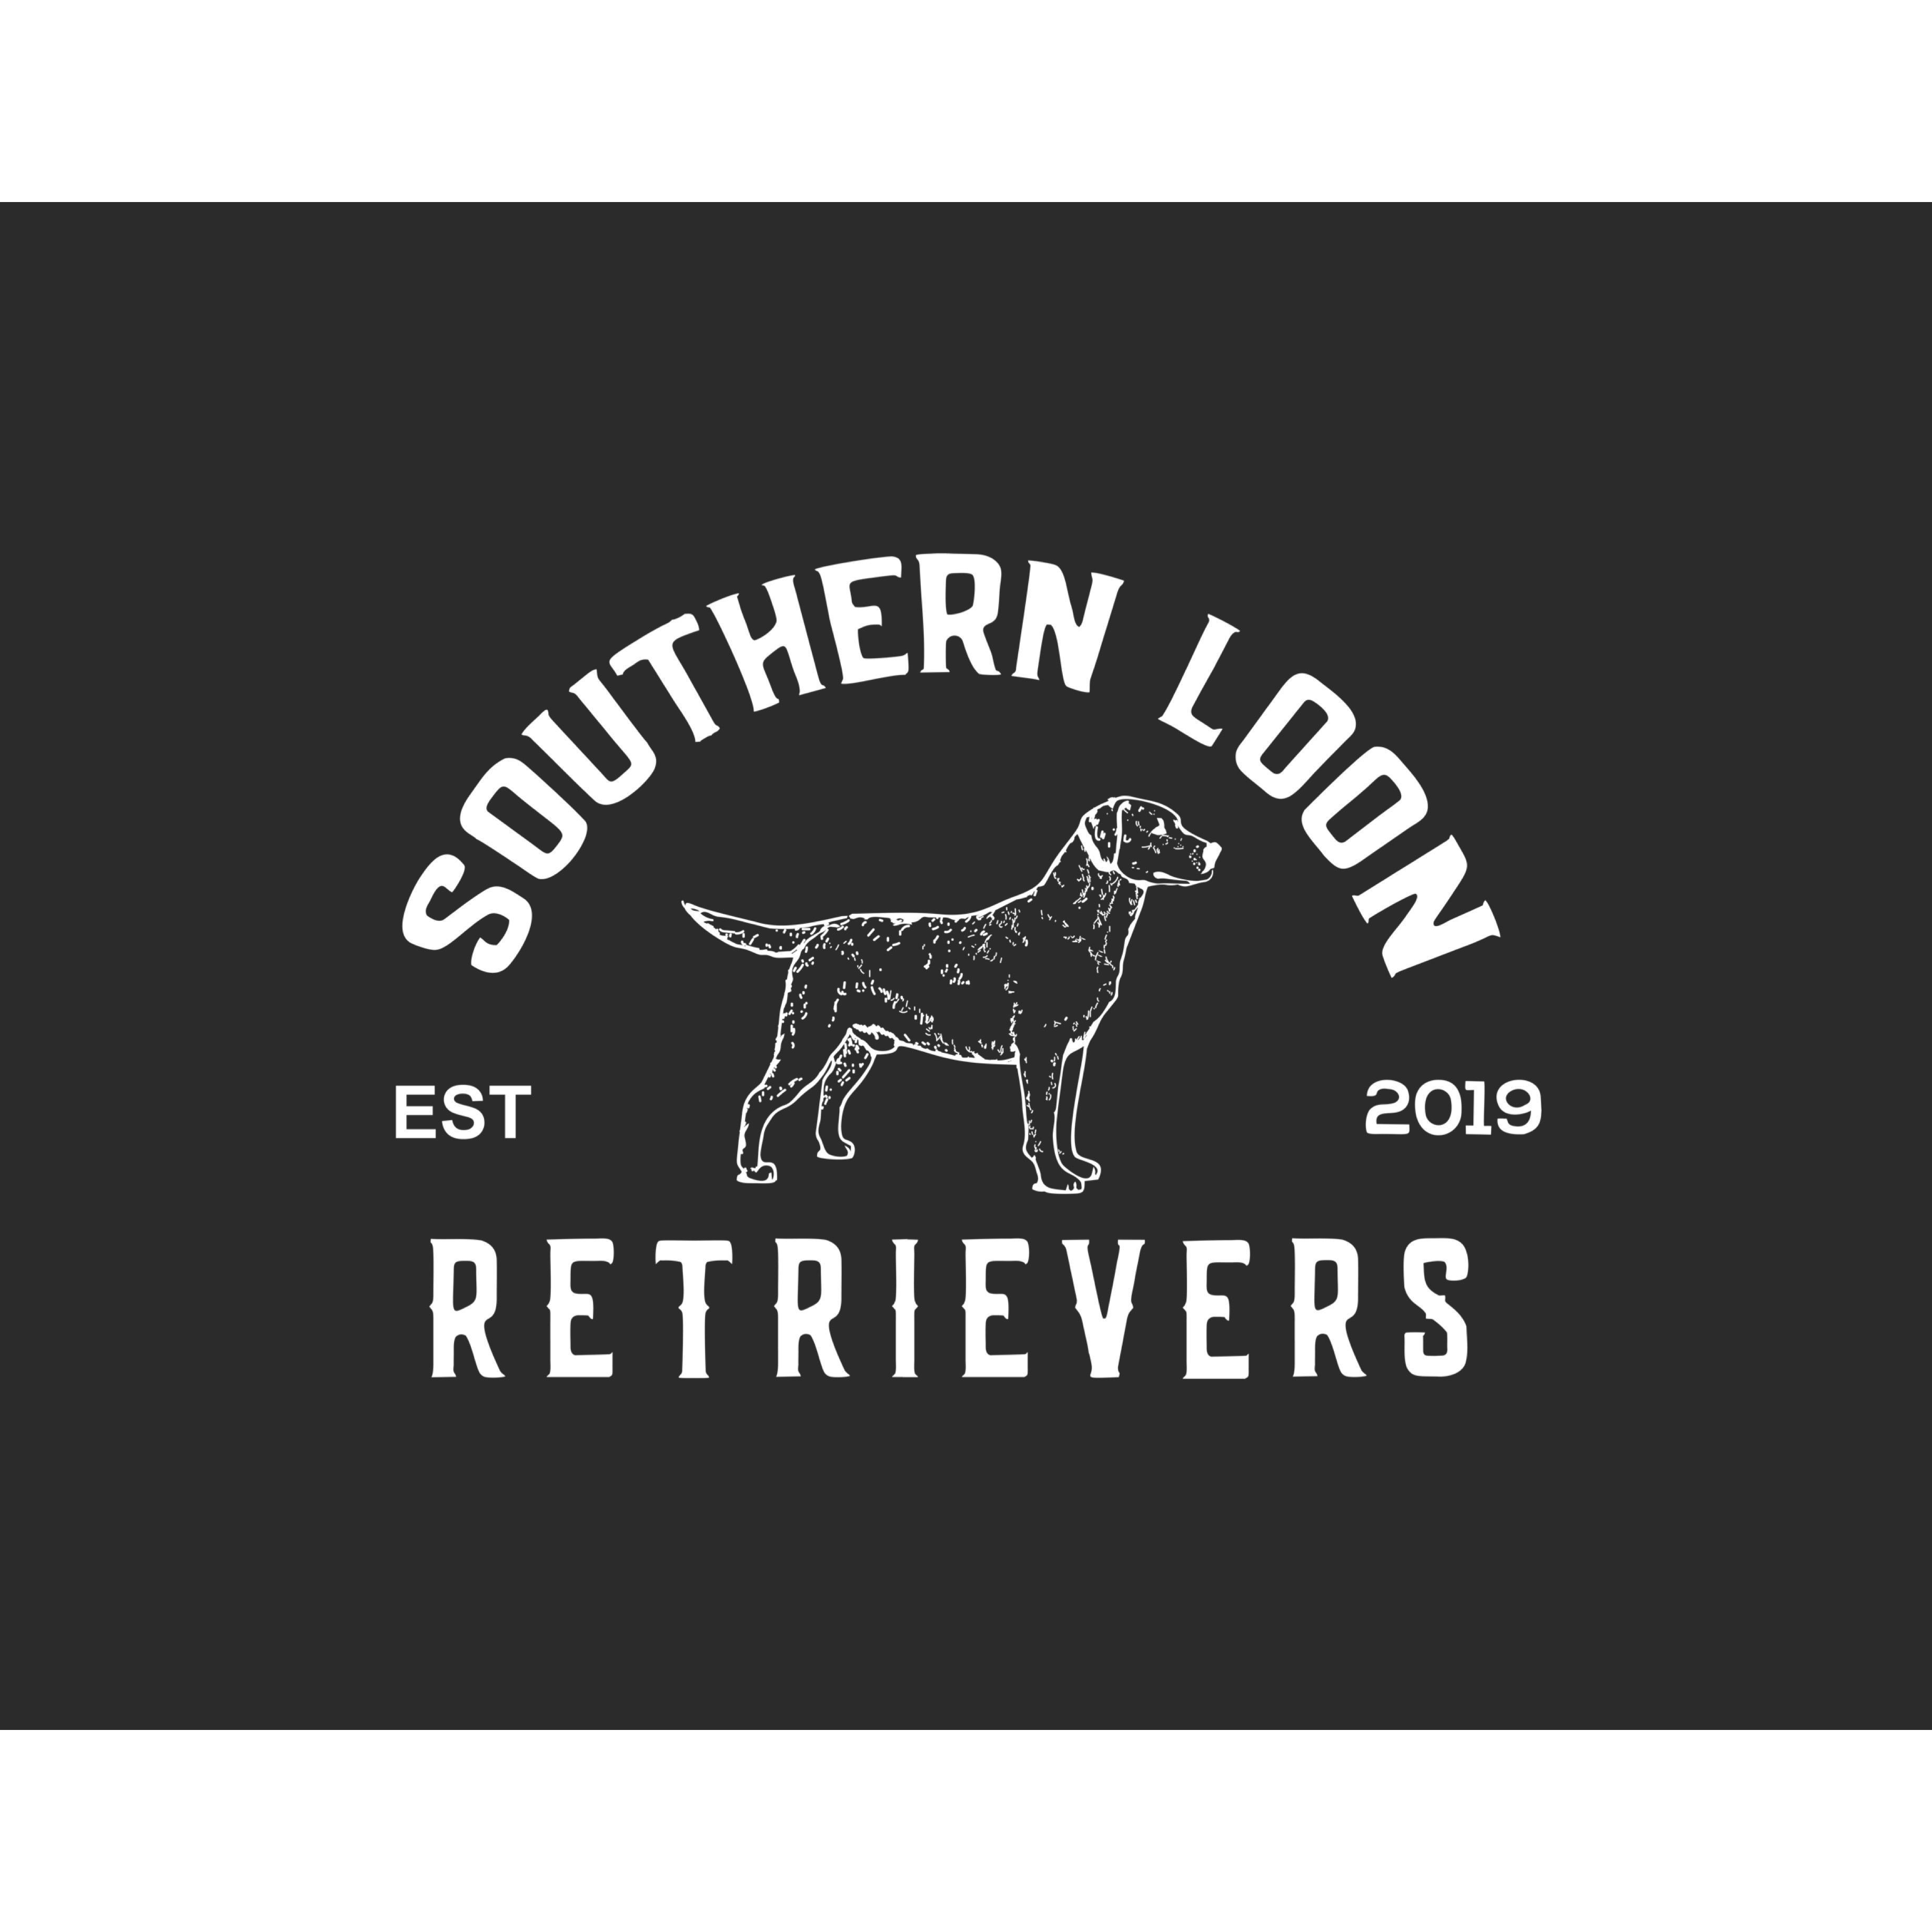 Southern Loon Retrievers LLC - Alburtis, PA 18011 - (570)225-8519 | ShowMeLocal.com